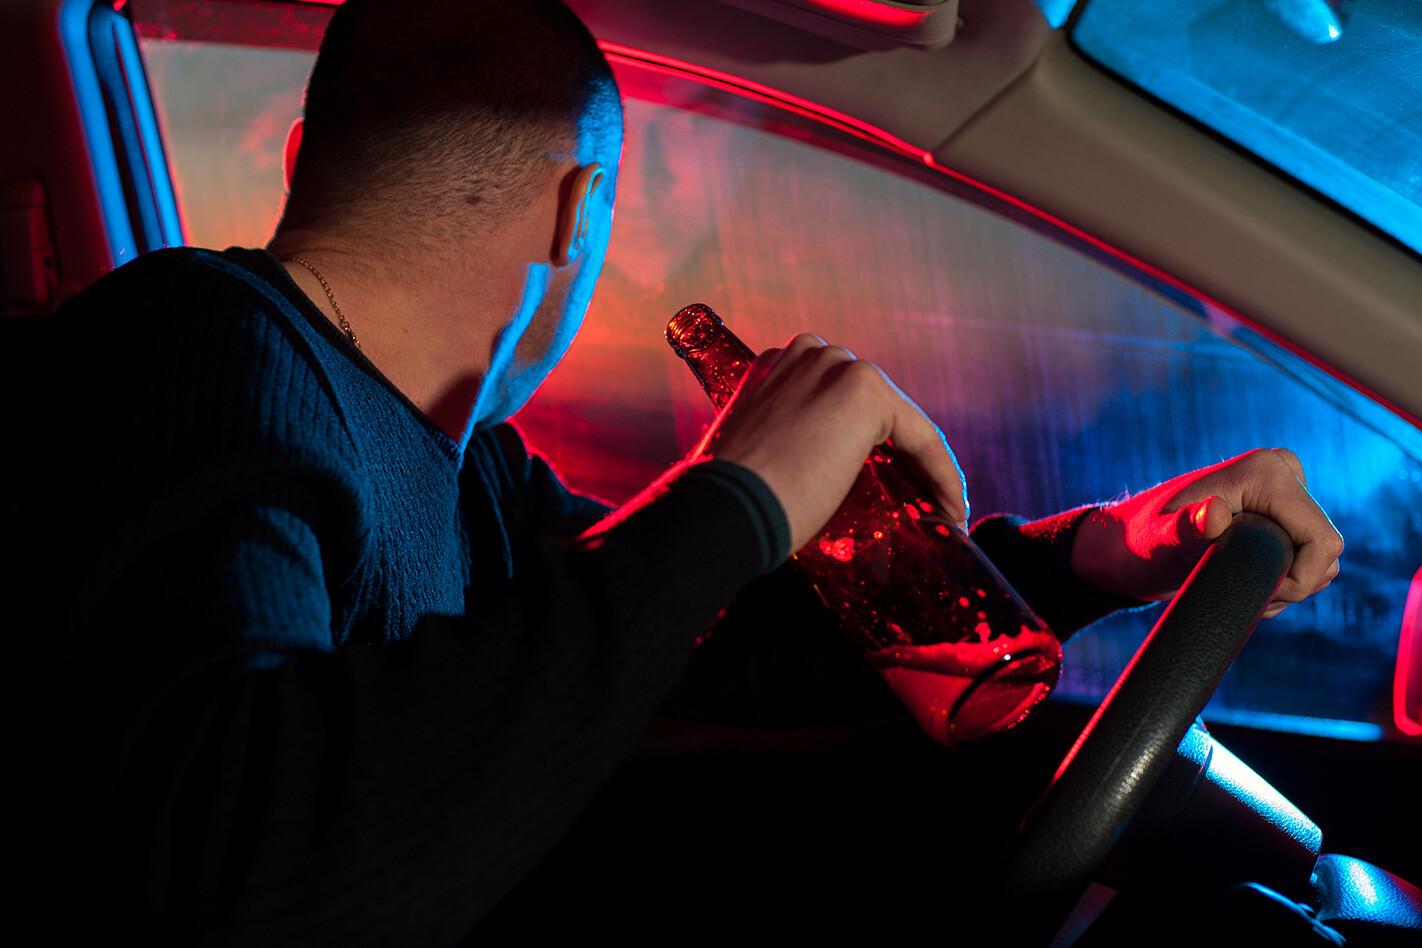 Police Drink Driving Jpg